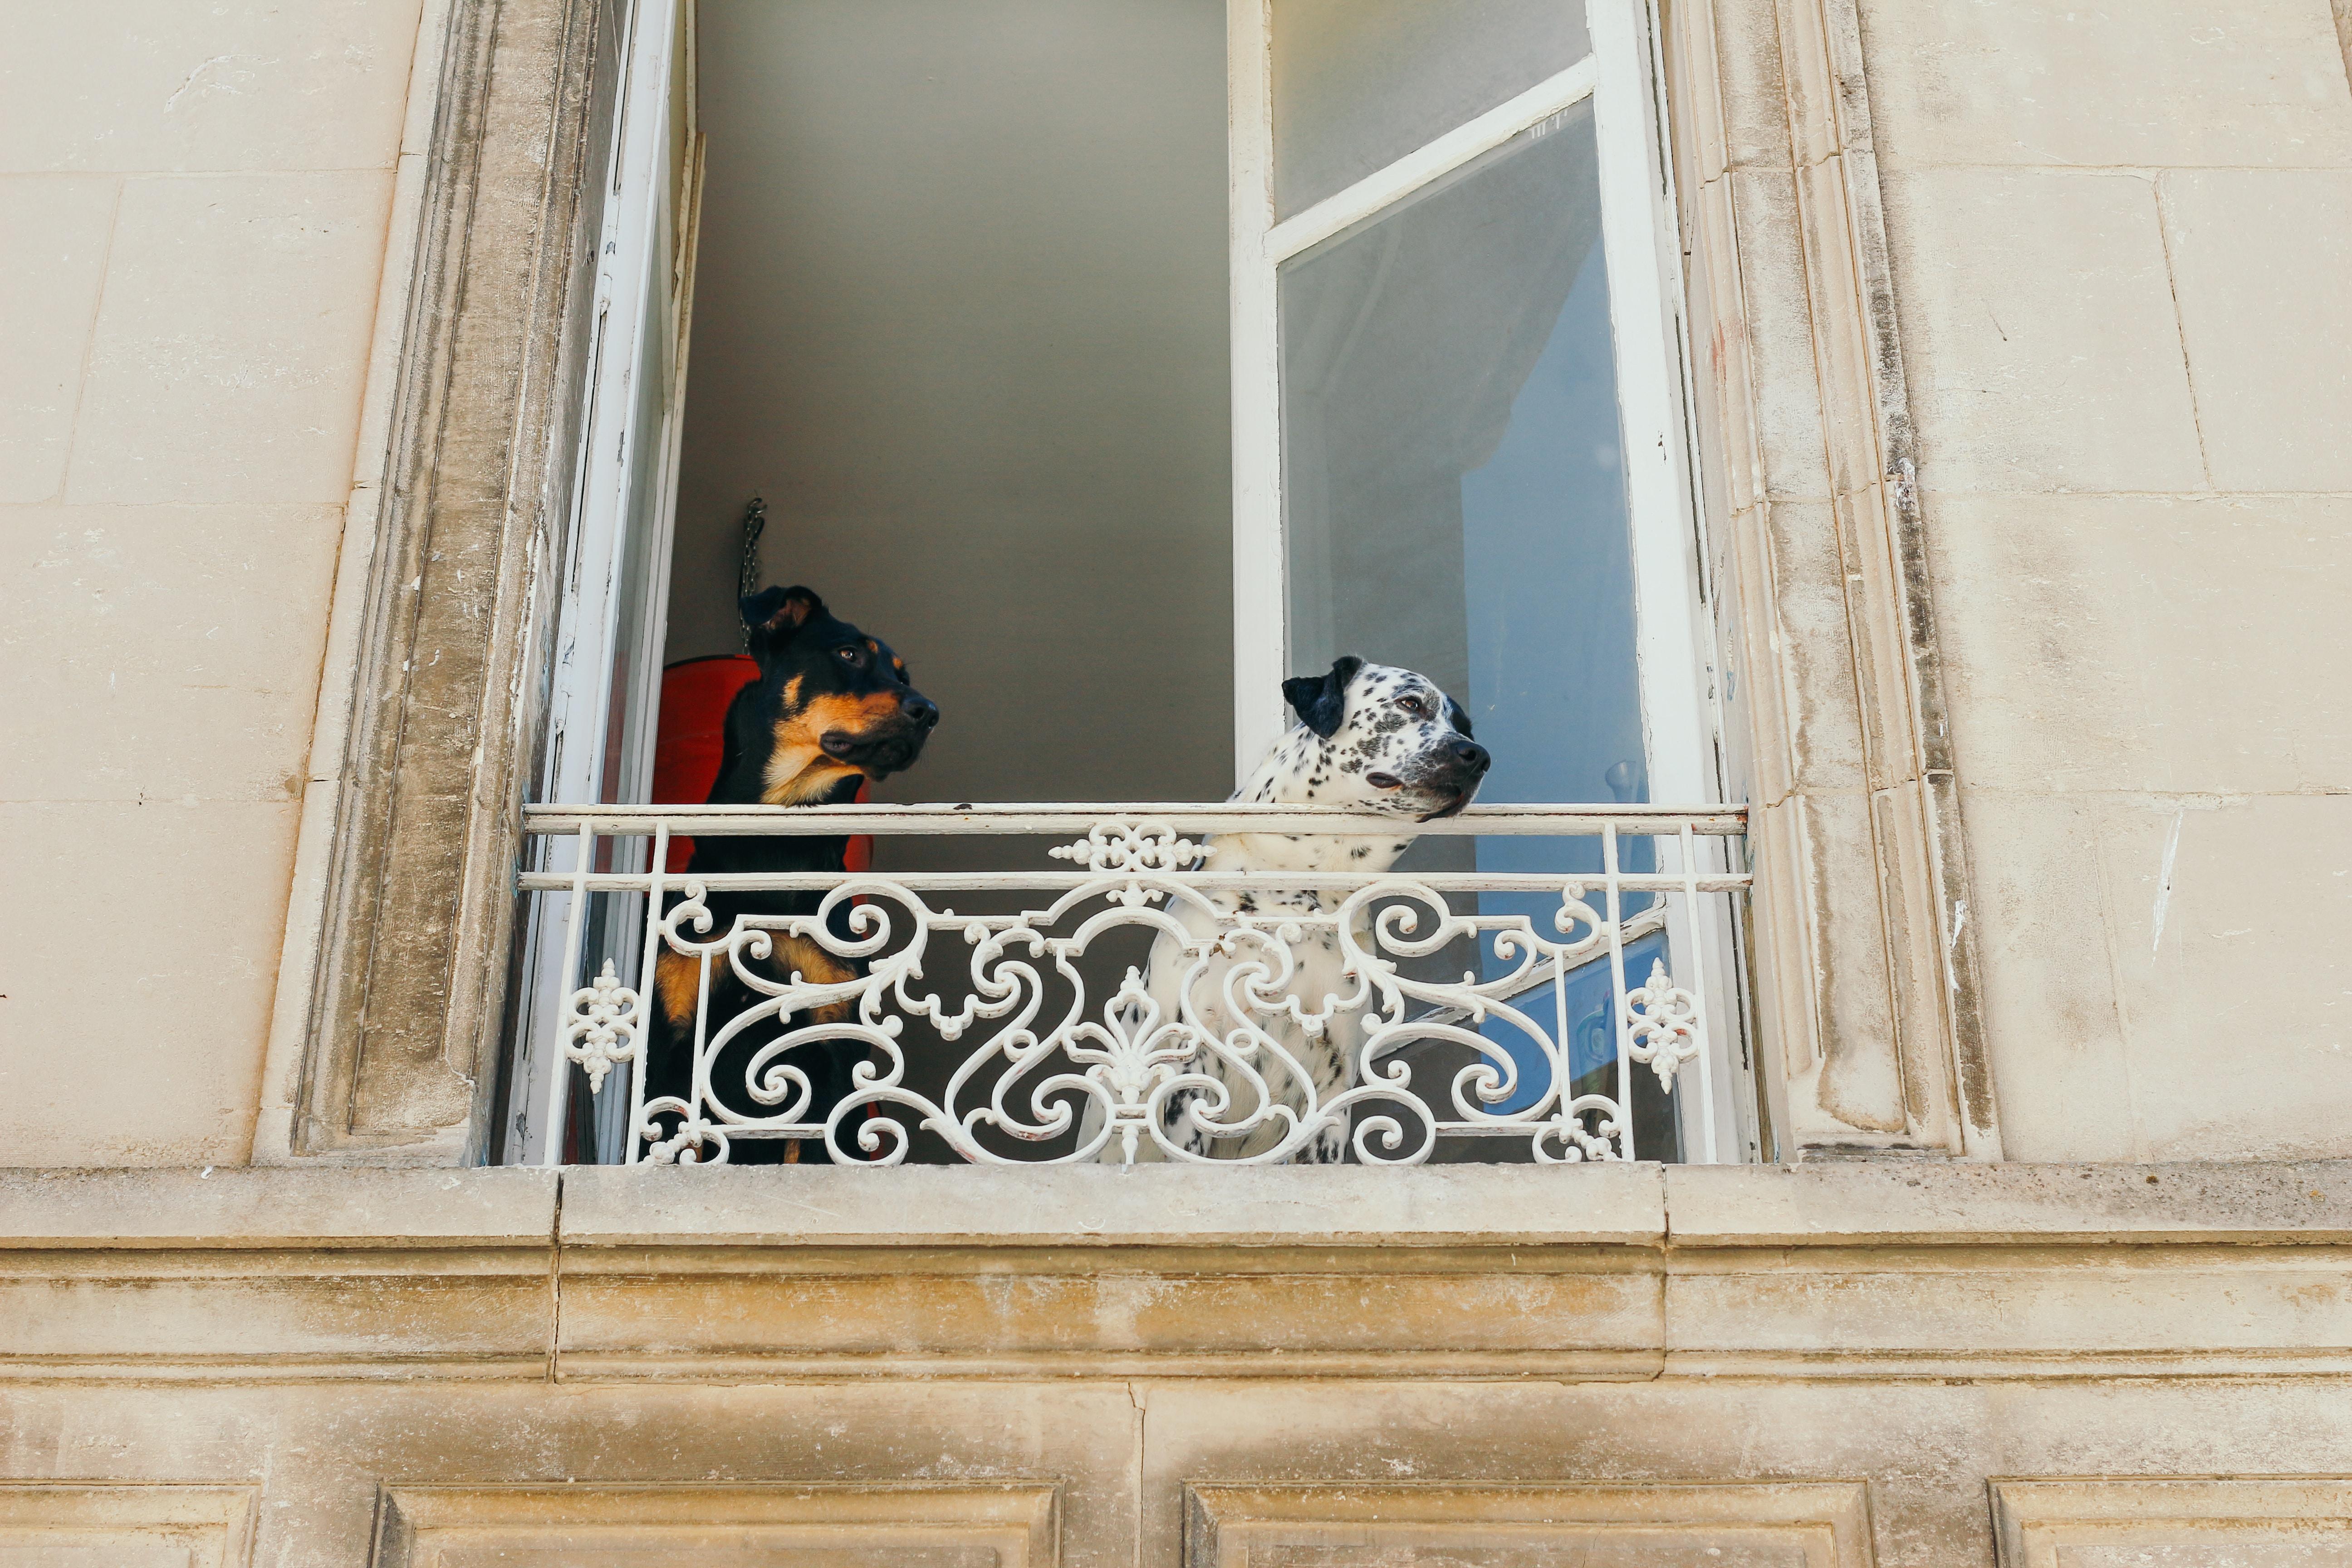 photo of two dogs near window